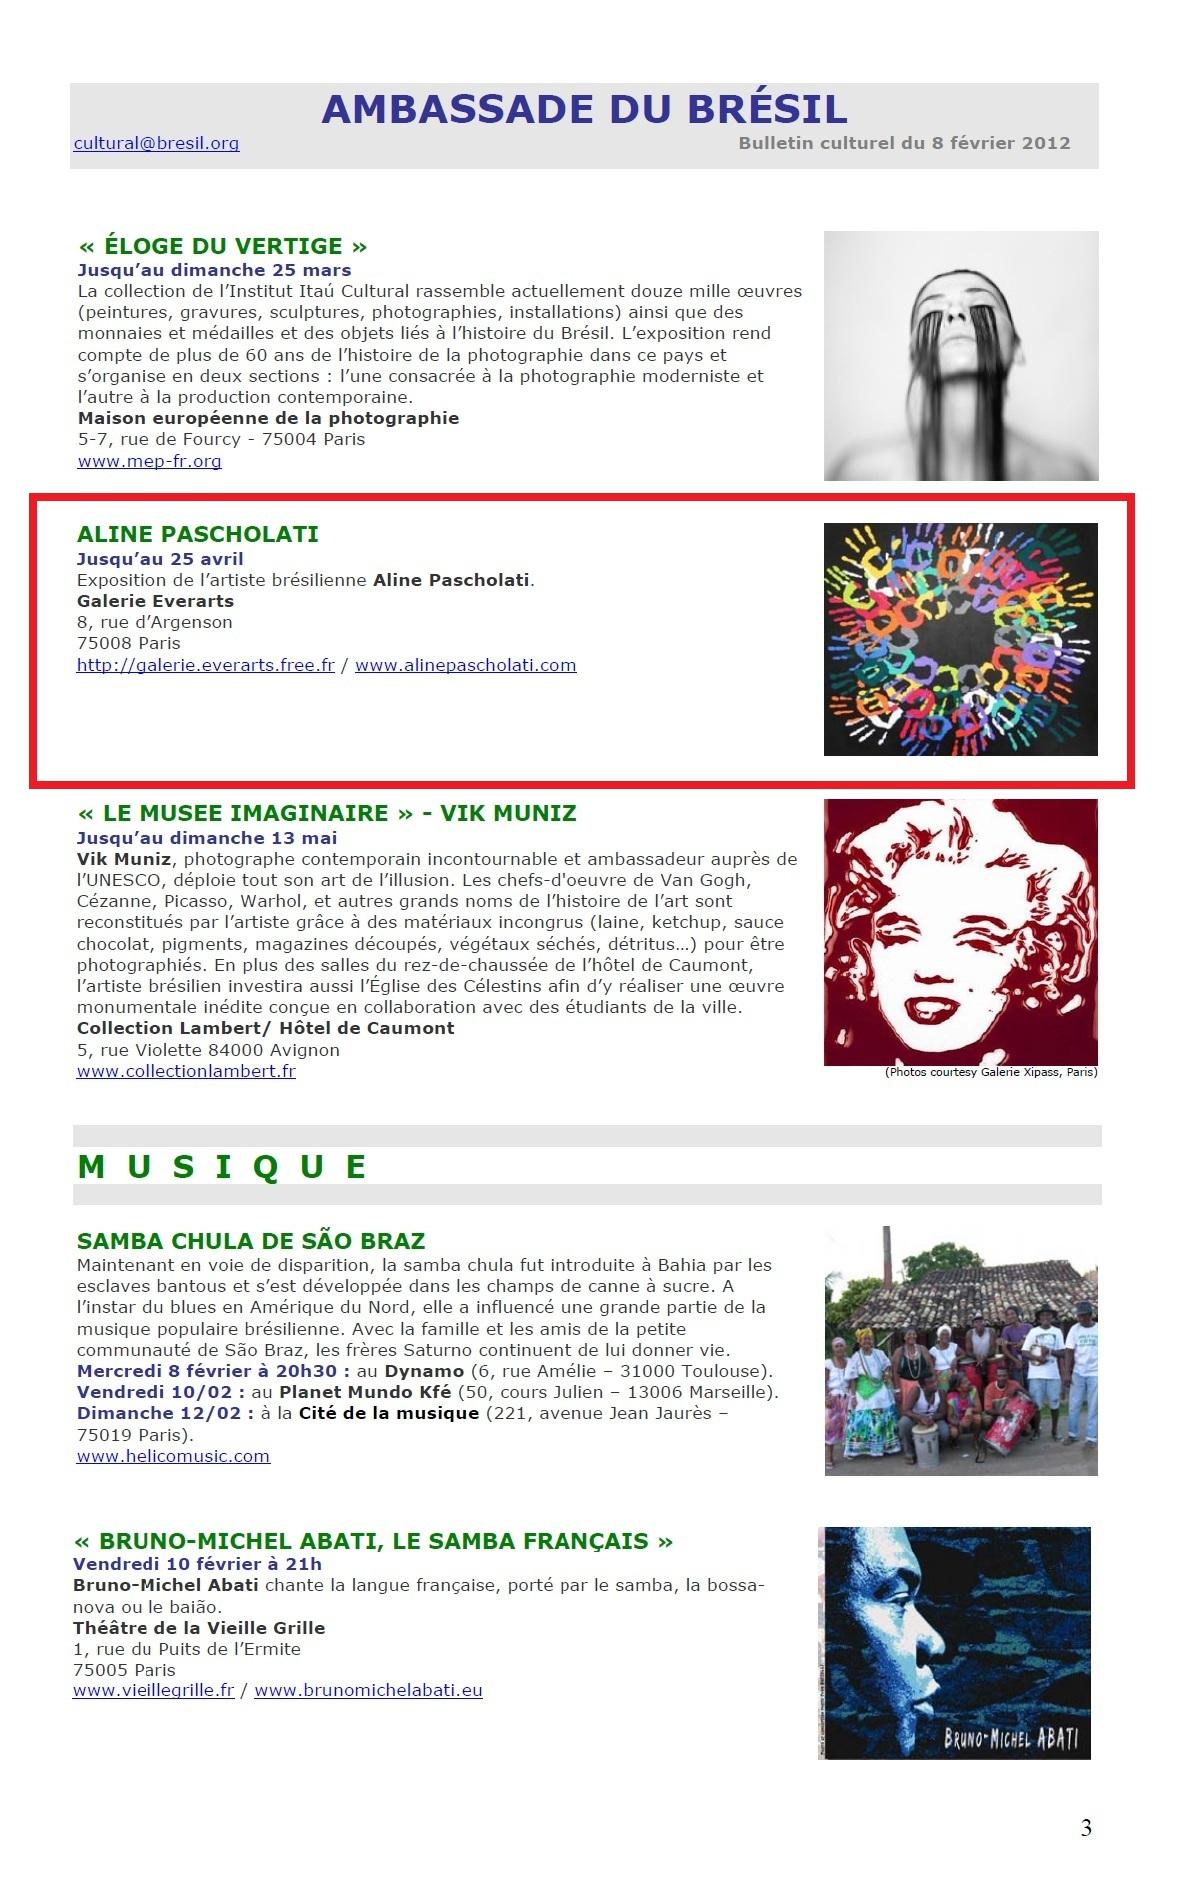 Bulletin Culturel Ambassade Brésil